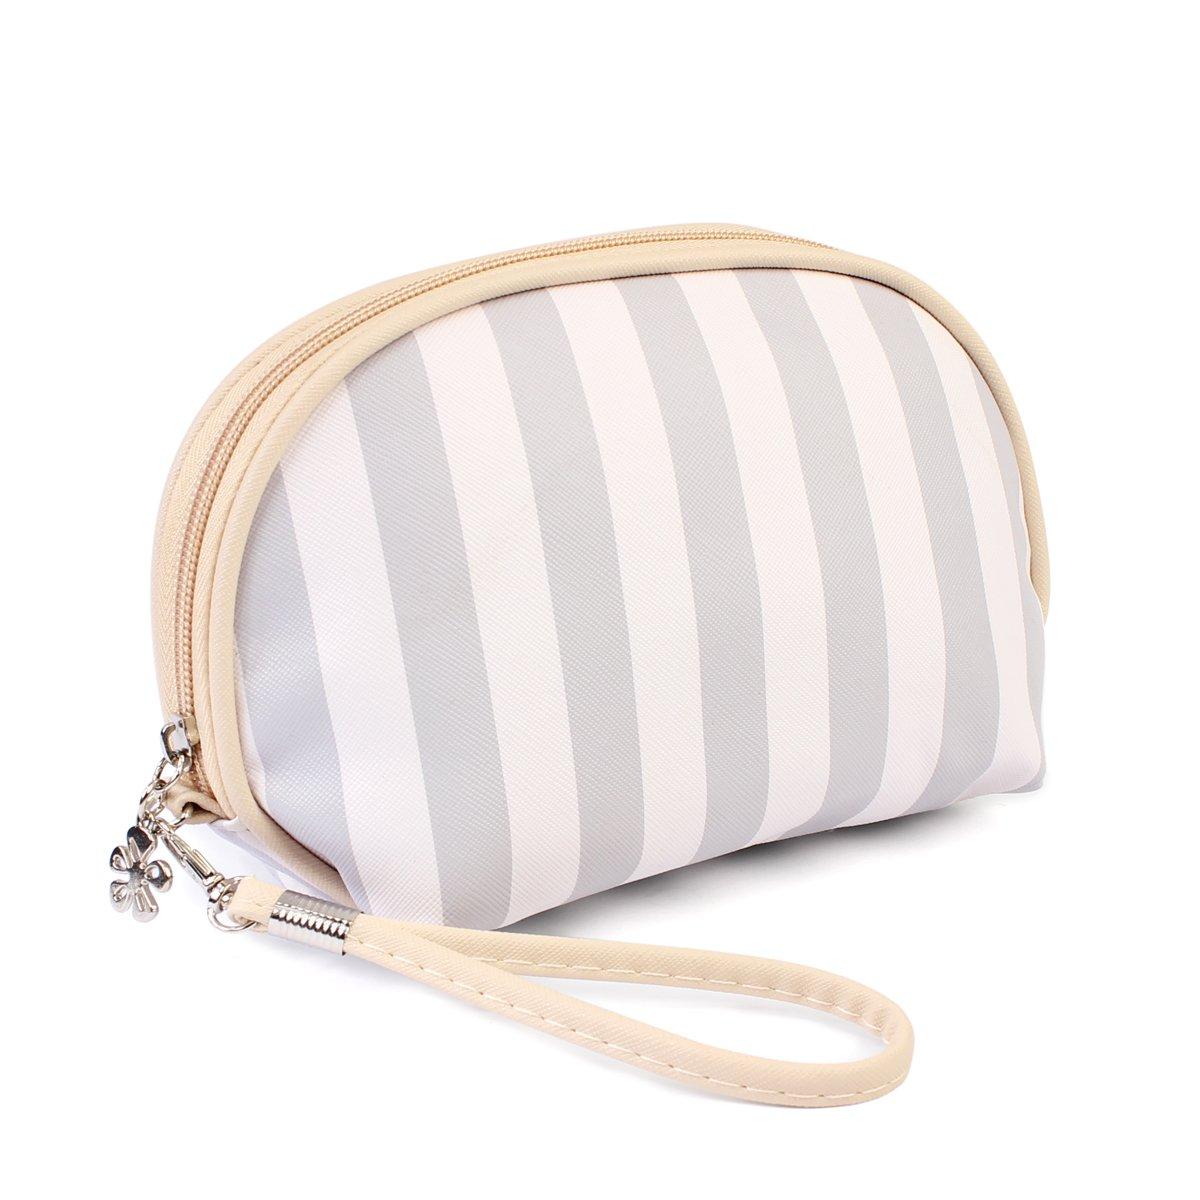 Multifunction Portable Travel Organizer - Cosmetic Makeup Pouch/Toiletry Purse/Jewelry Bag/Print School Pencil Case/Metallic Zip Clutch/Striped Wristlet (Round - Grey Stripe)